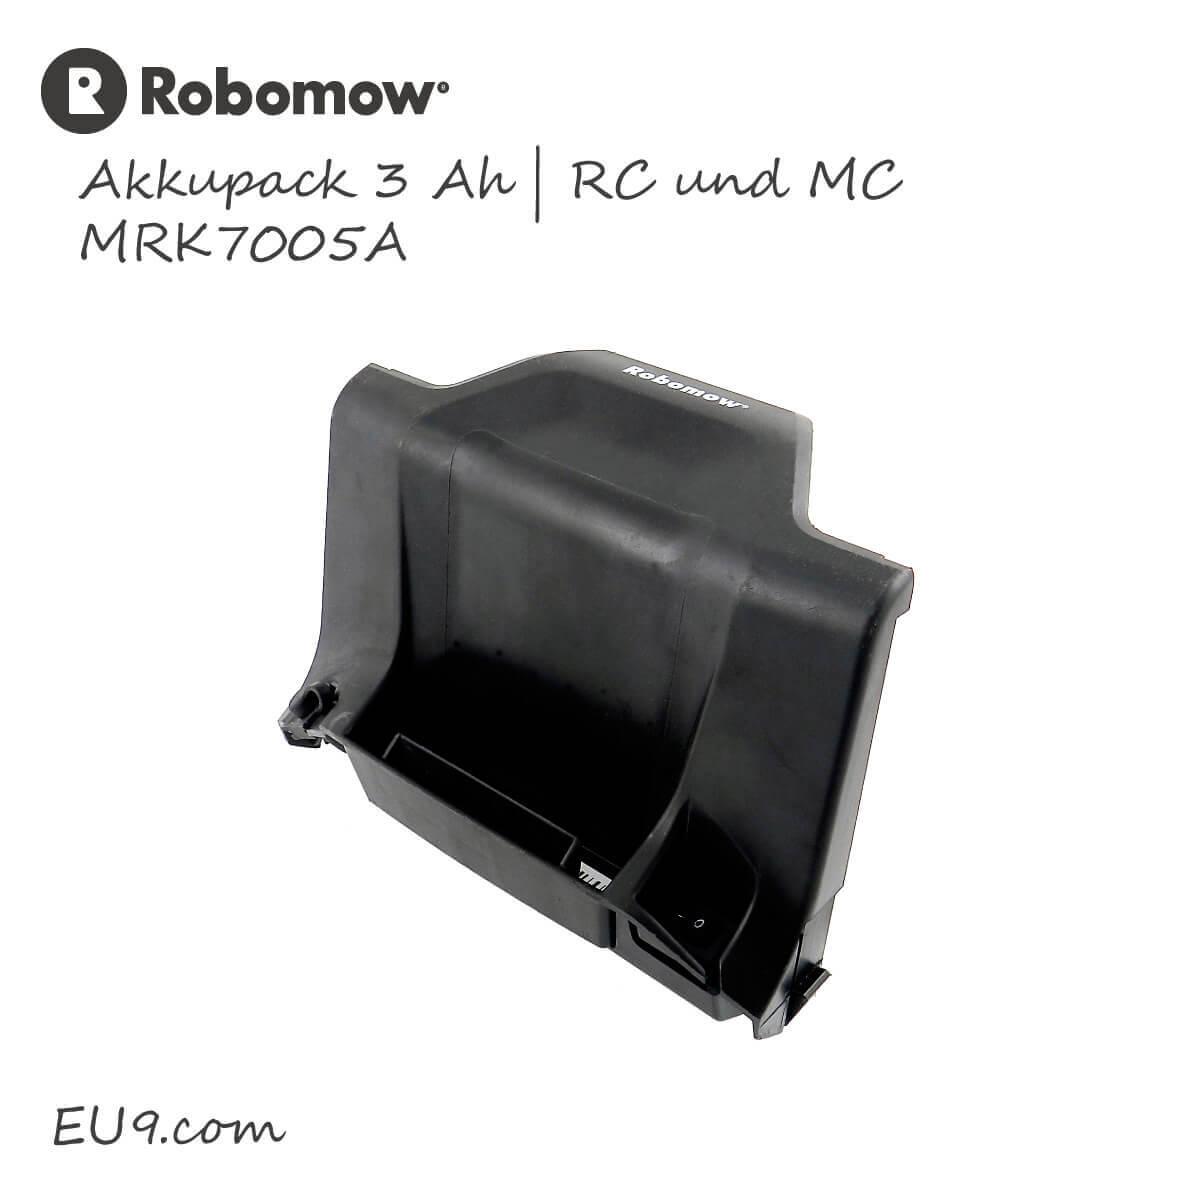 City MC400 AKKU BATTERIE 4000mAh für Robomow City MC300 City MC500